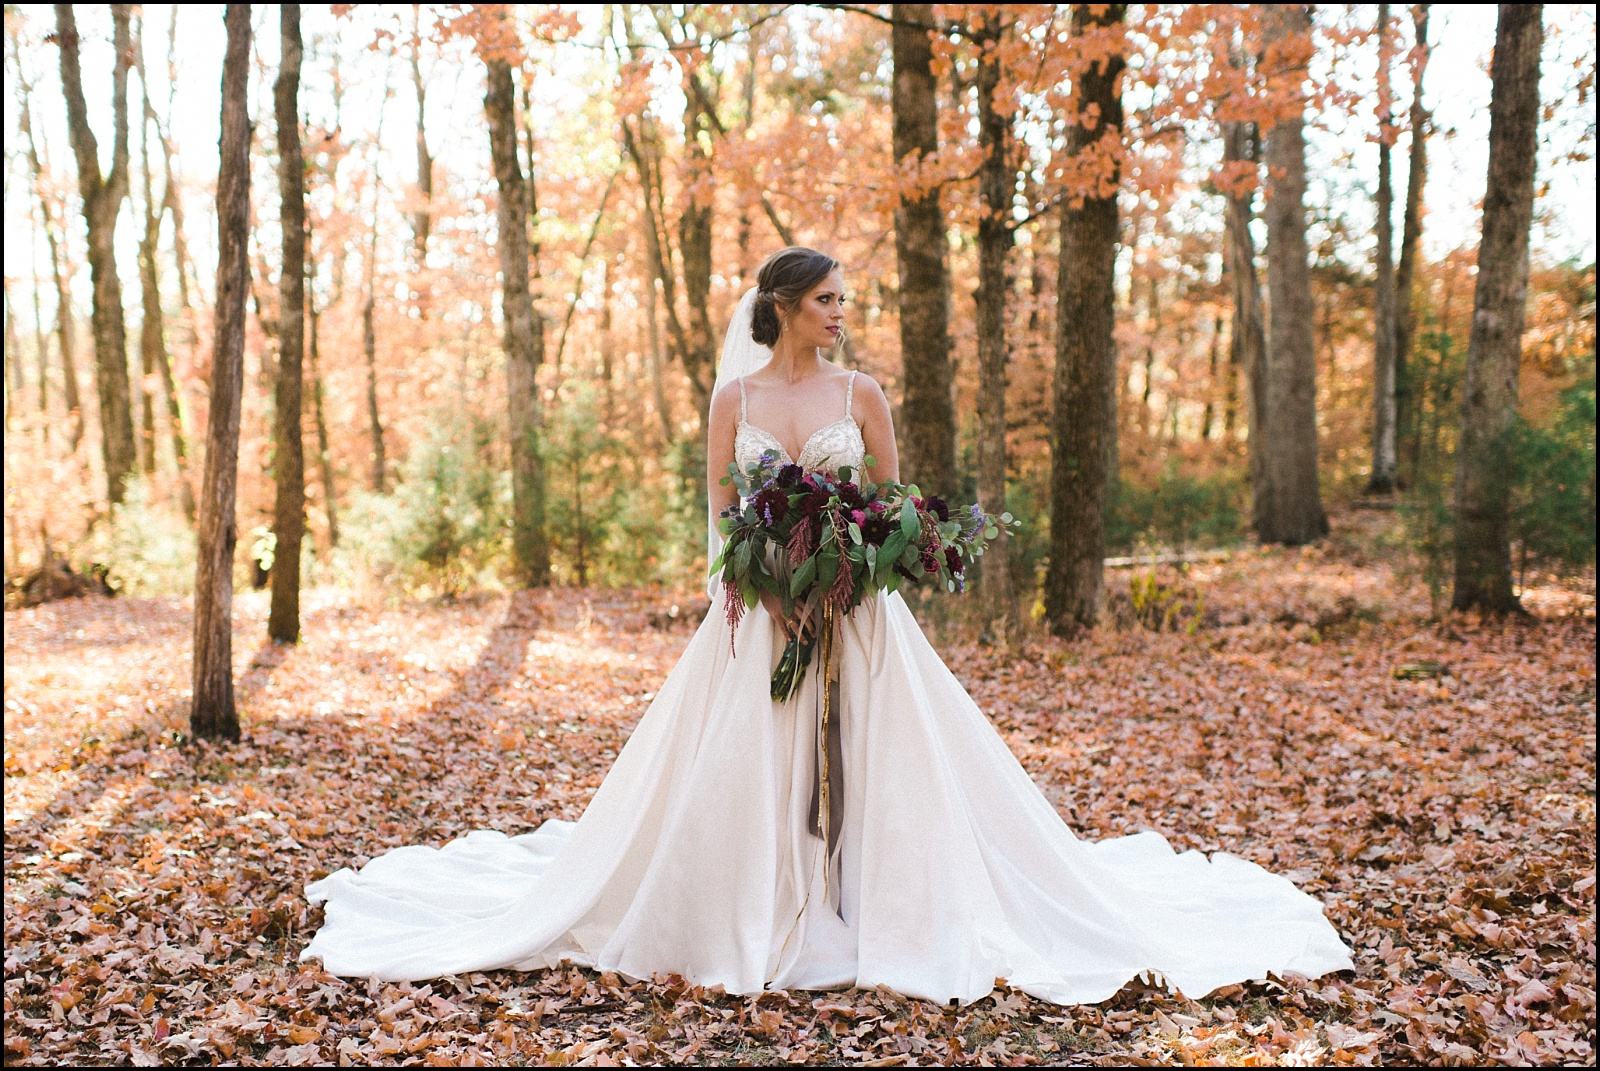 Bride portrait at Cedars of Lebanon wedding in Fall